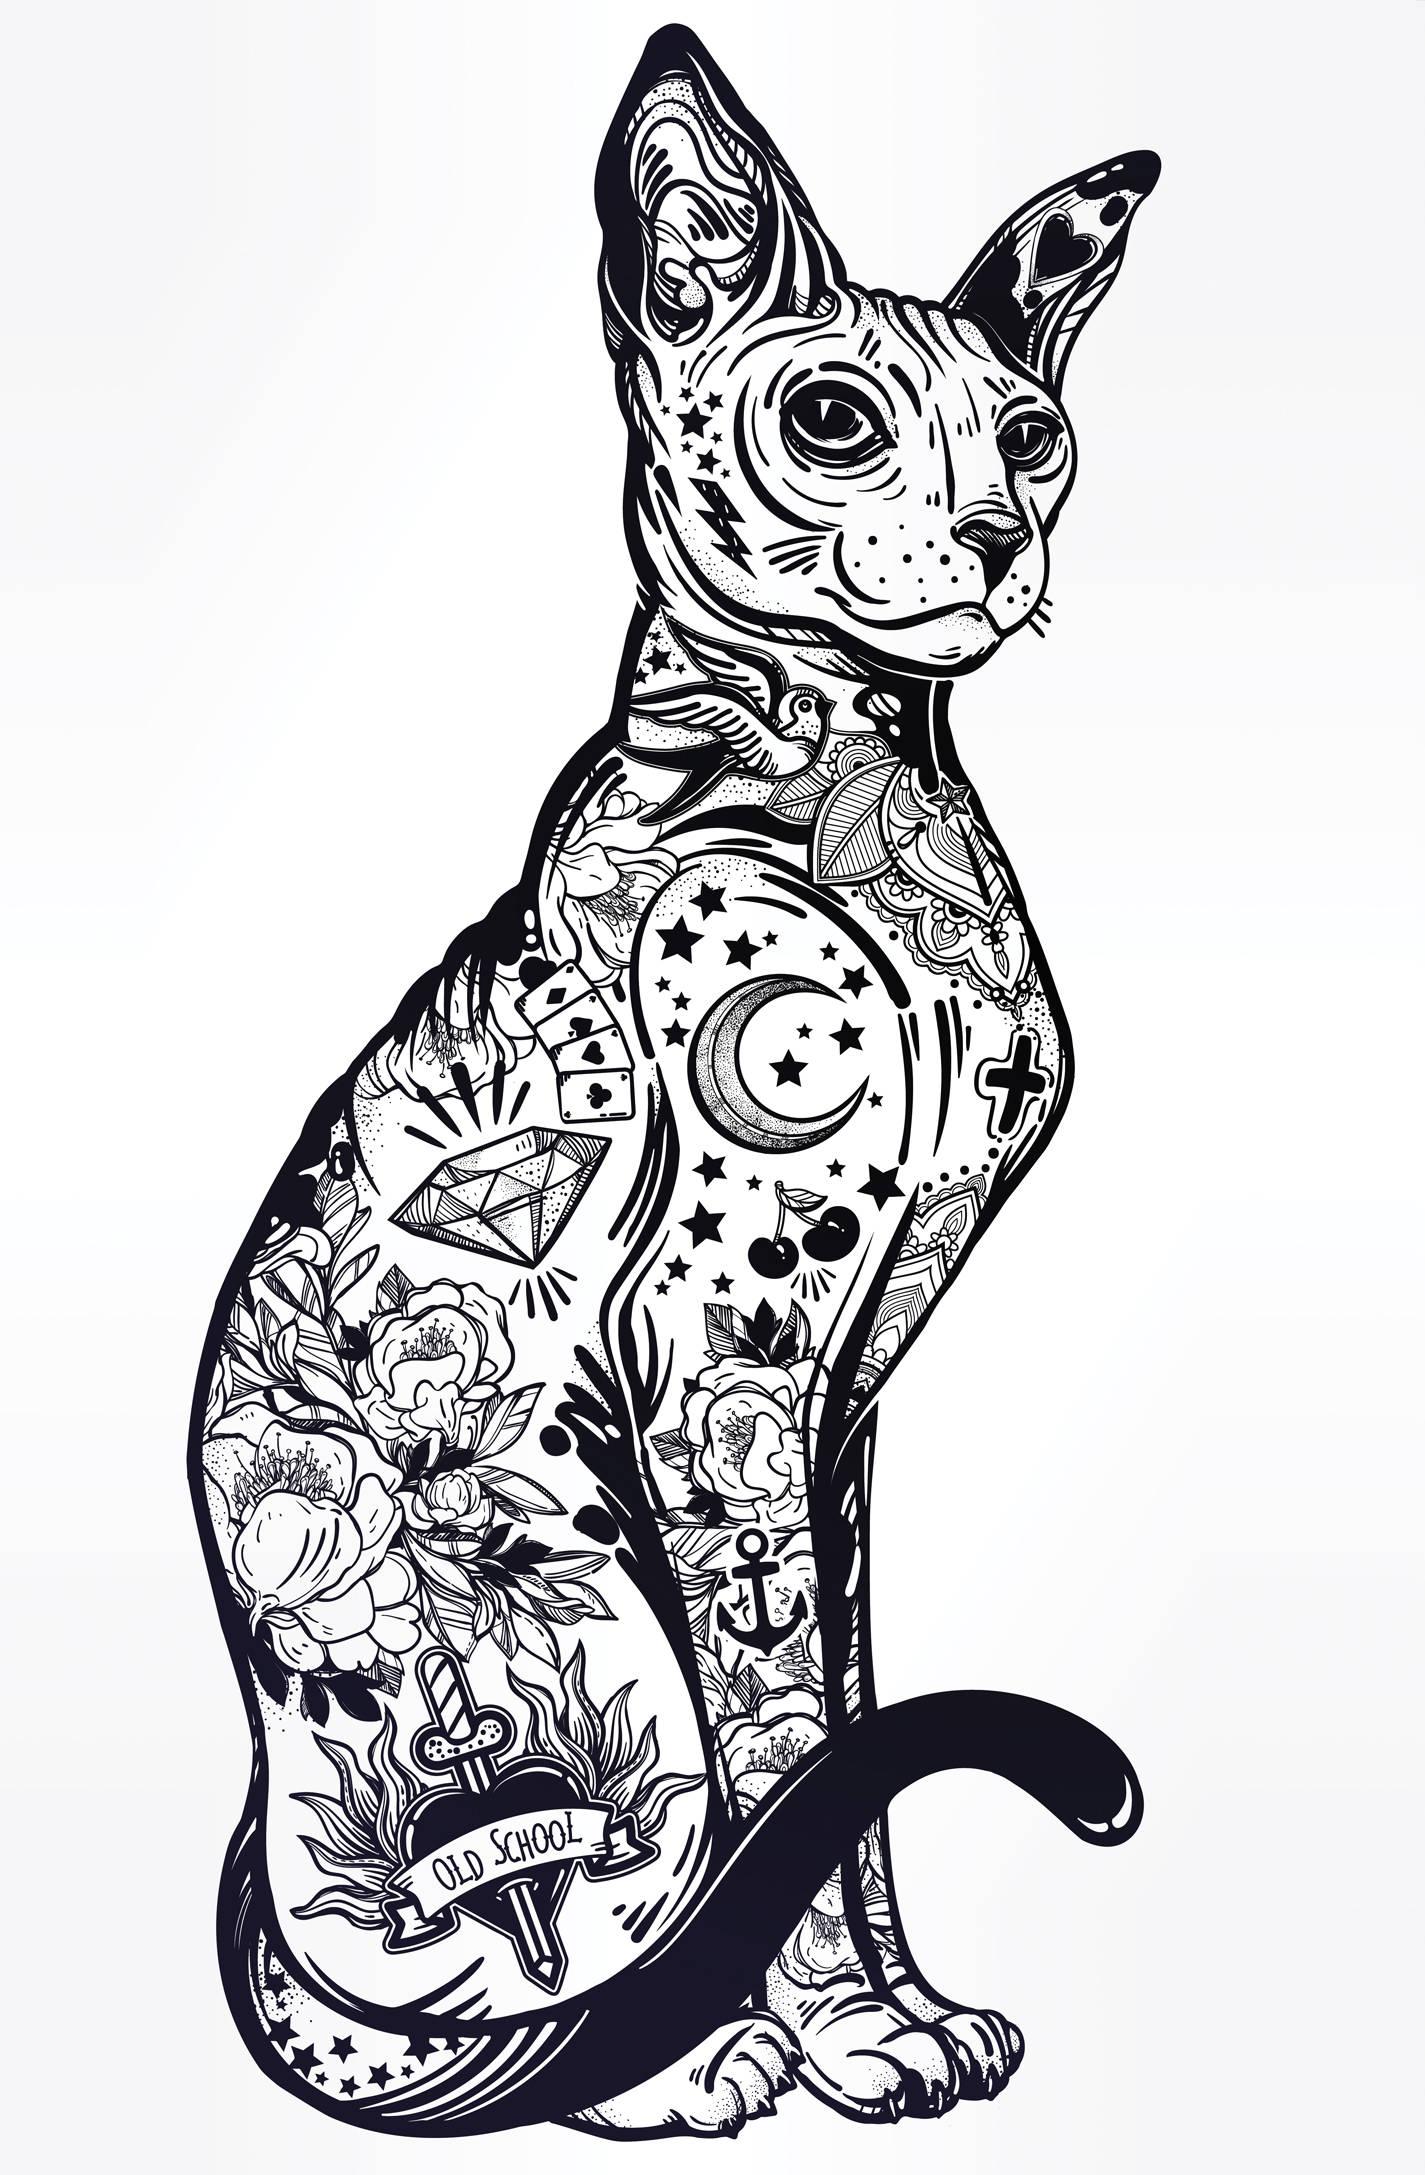 Sphynx Cat, Hairless Cat, Flash Tattoo Art, Tattoo Art, Hipster, Home